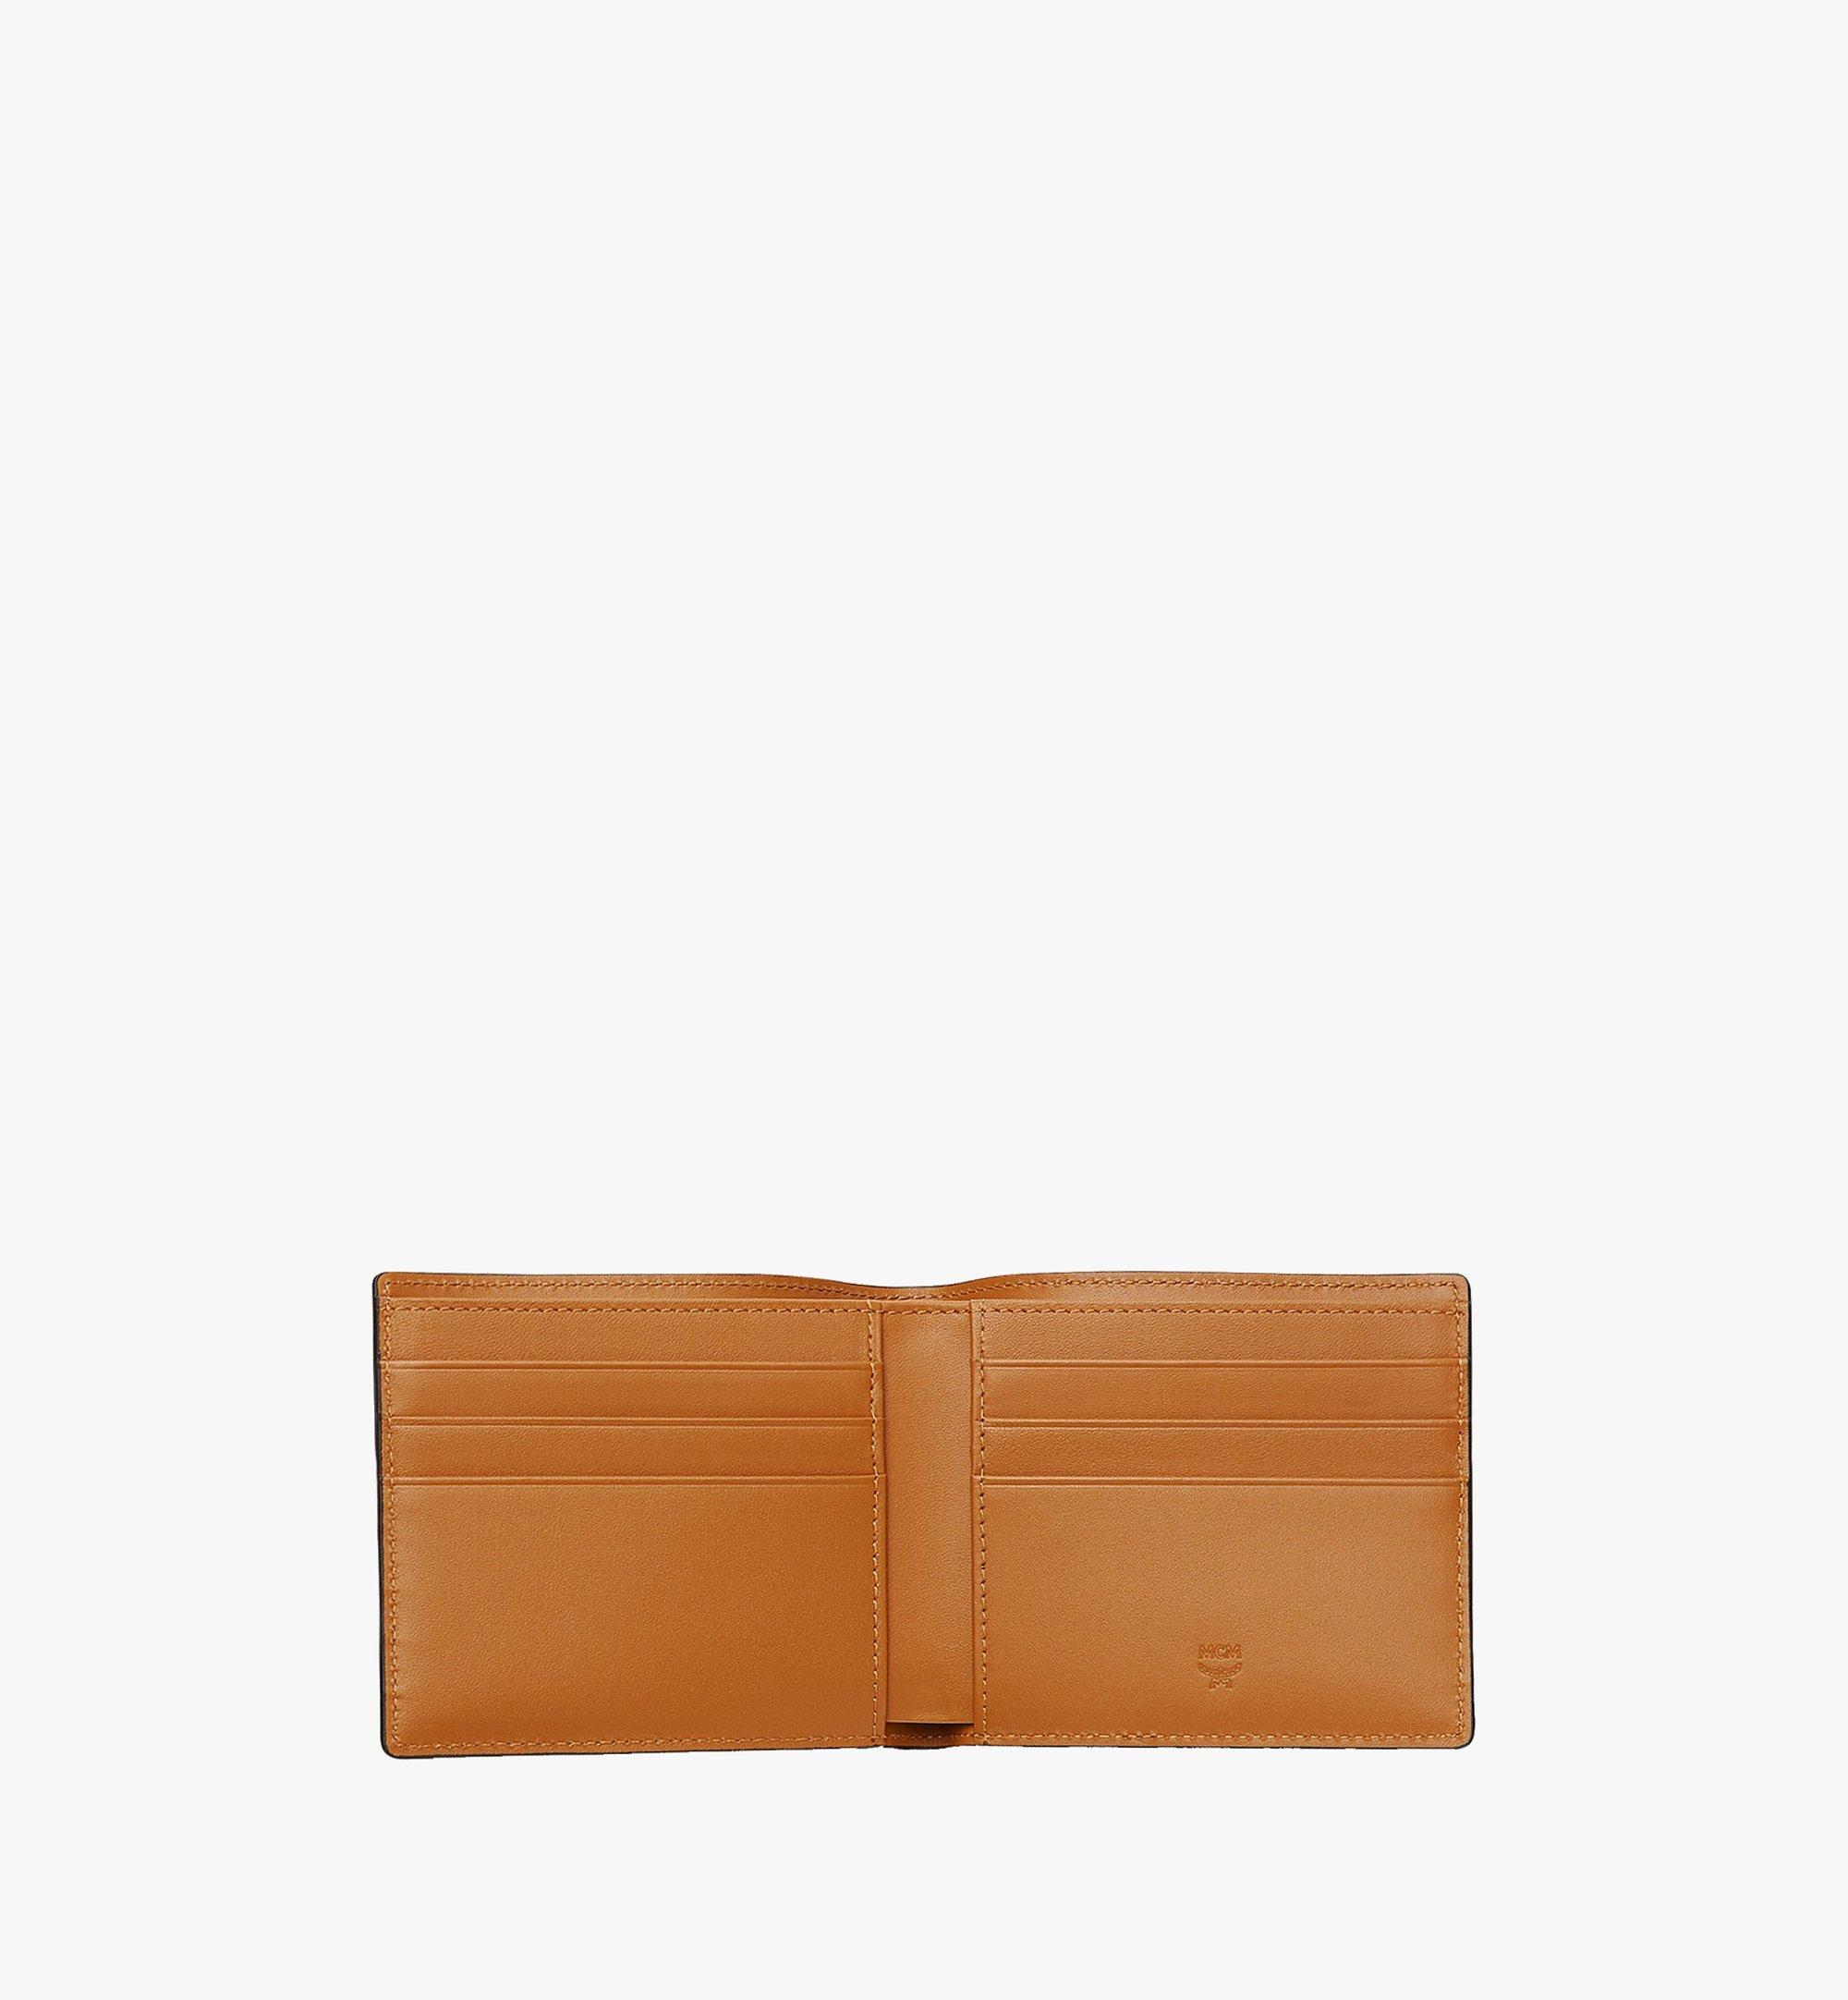 MCM Bifold Wallet in Visetos Original Cognac MXSAAVI04CO001 Alternate View 3